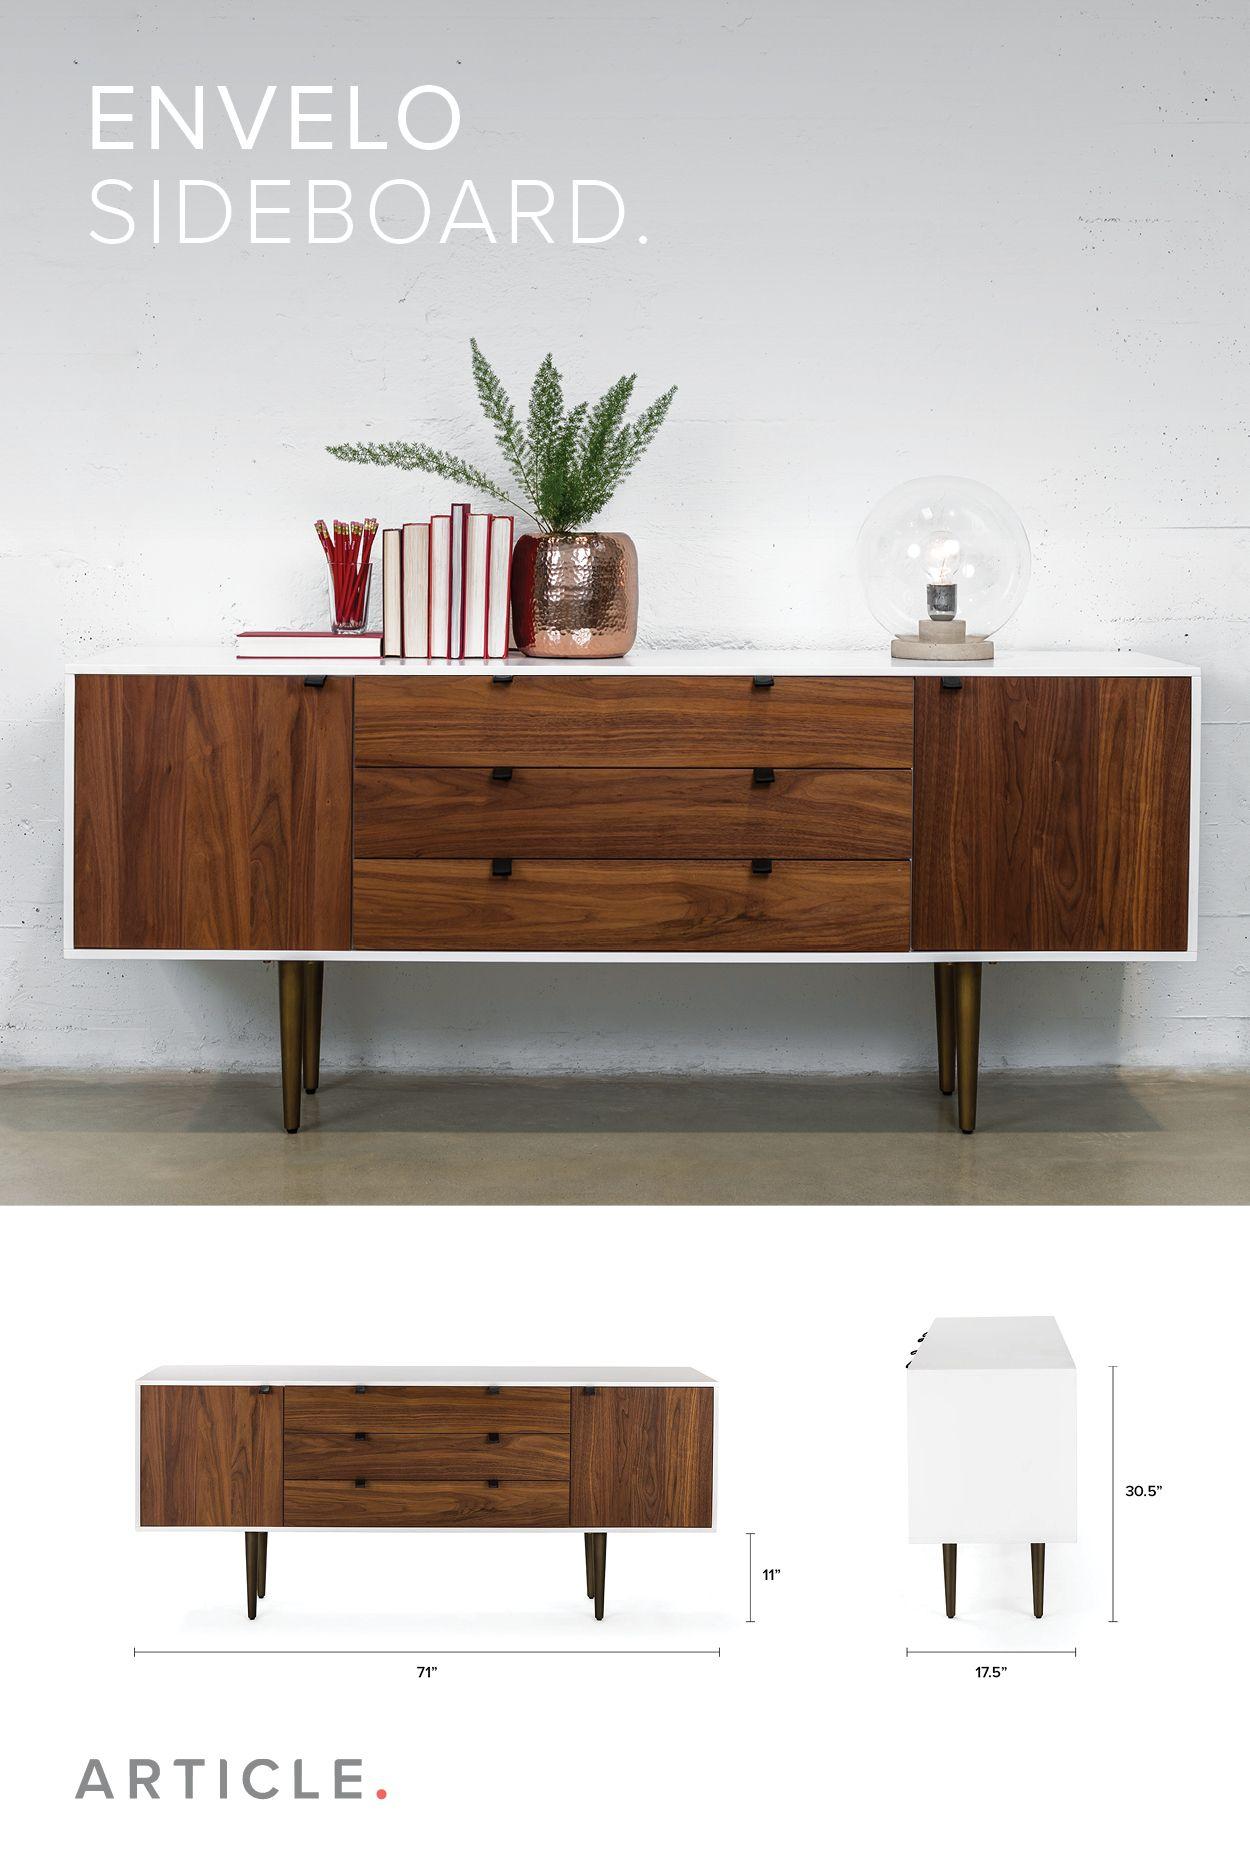 White And Walnut Sideboard Bronze Legs Article Envelo Modern